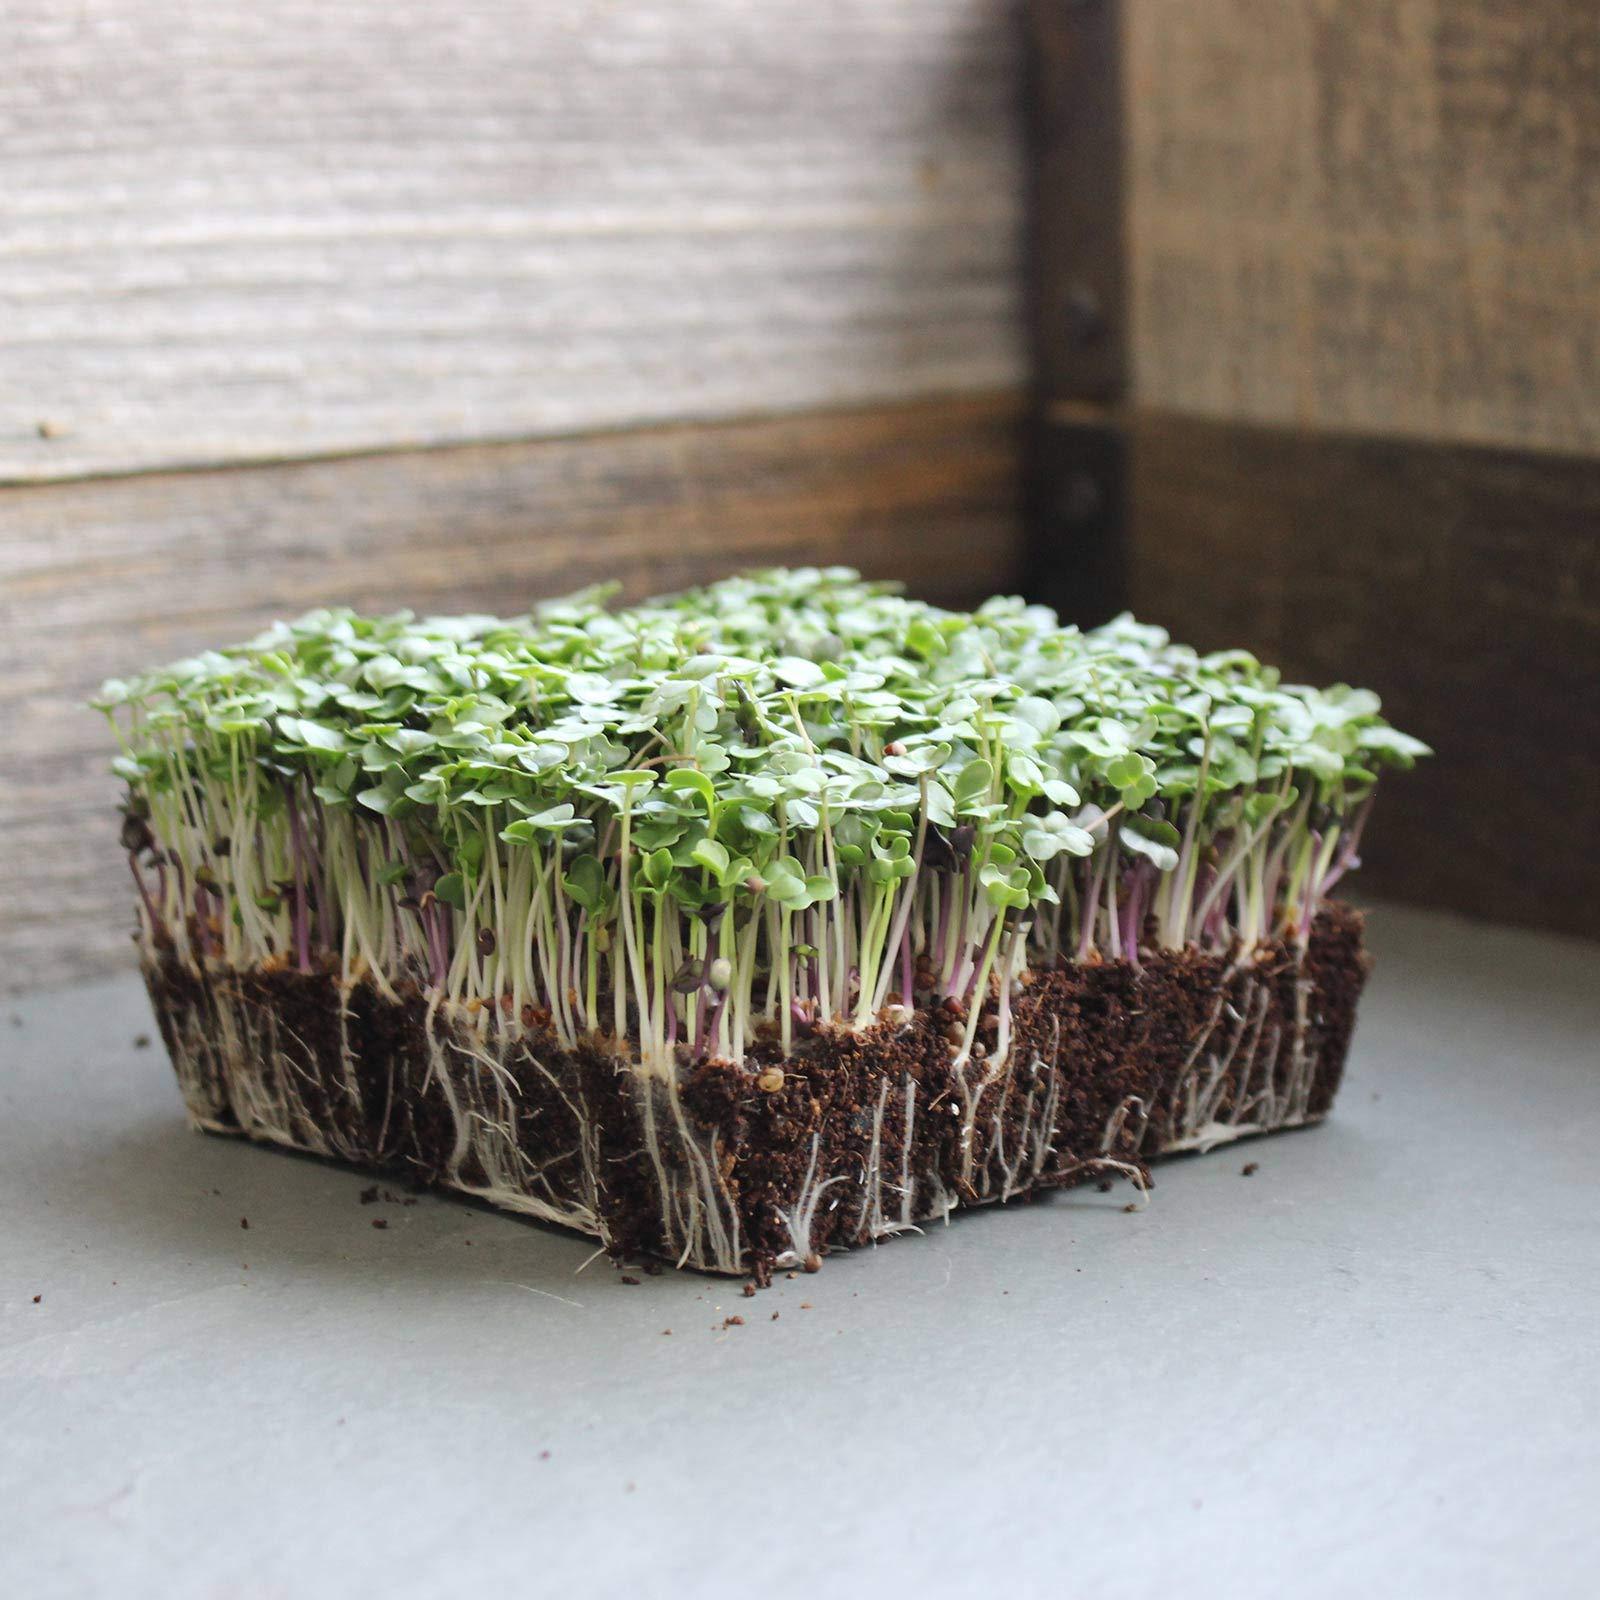 Basic Salad Mix Micro Greens Seeds: 25 Lb - Bulk Non-GMO Seed Blend: Broccoli, Kale, Kohlrabi, Cabbage, Arugula, More by Mountain Valley Seed Company (Image #5)